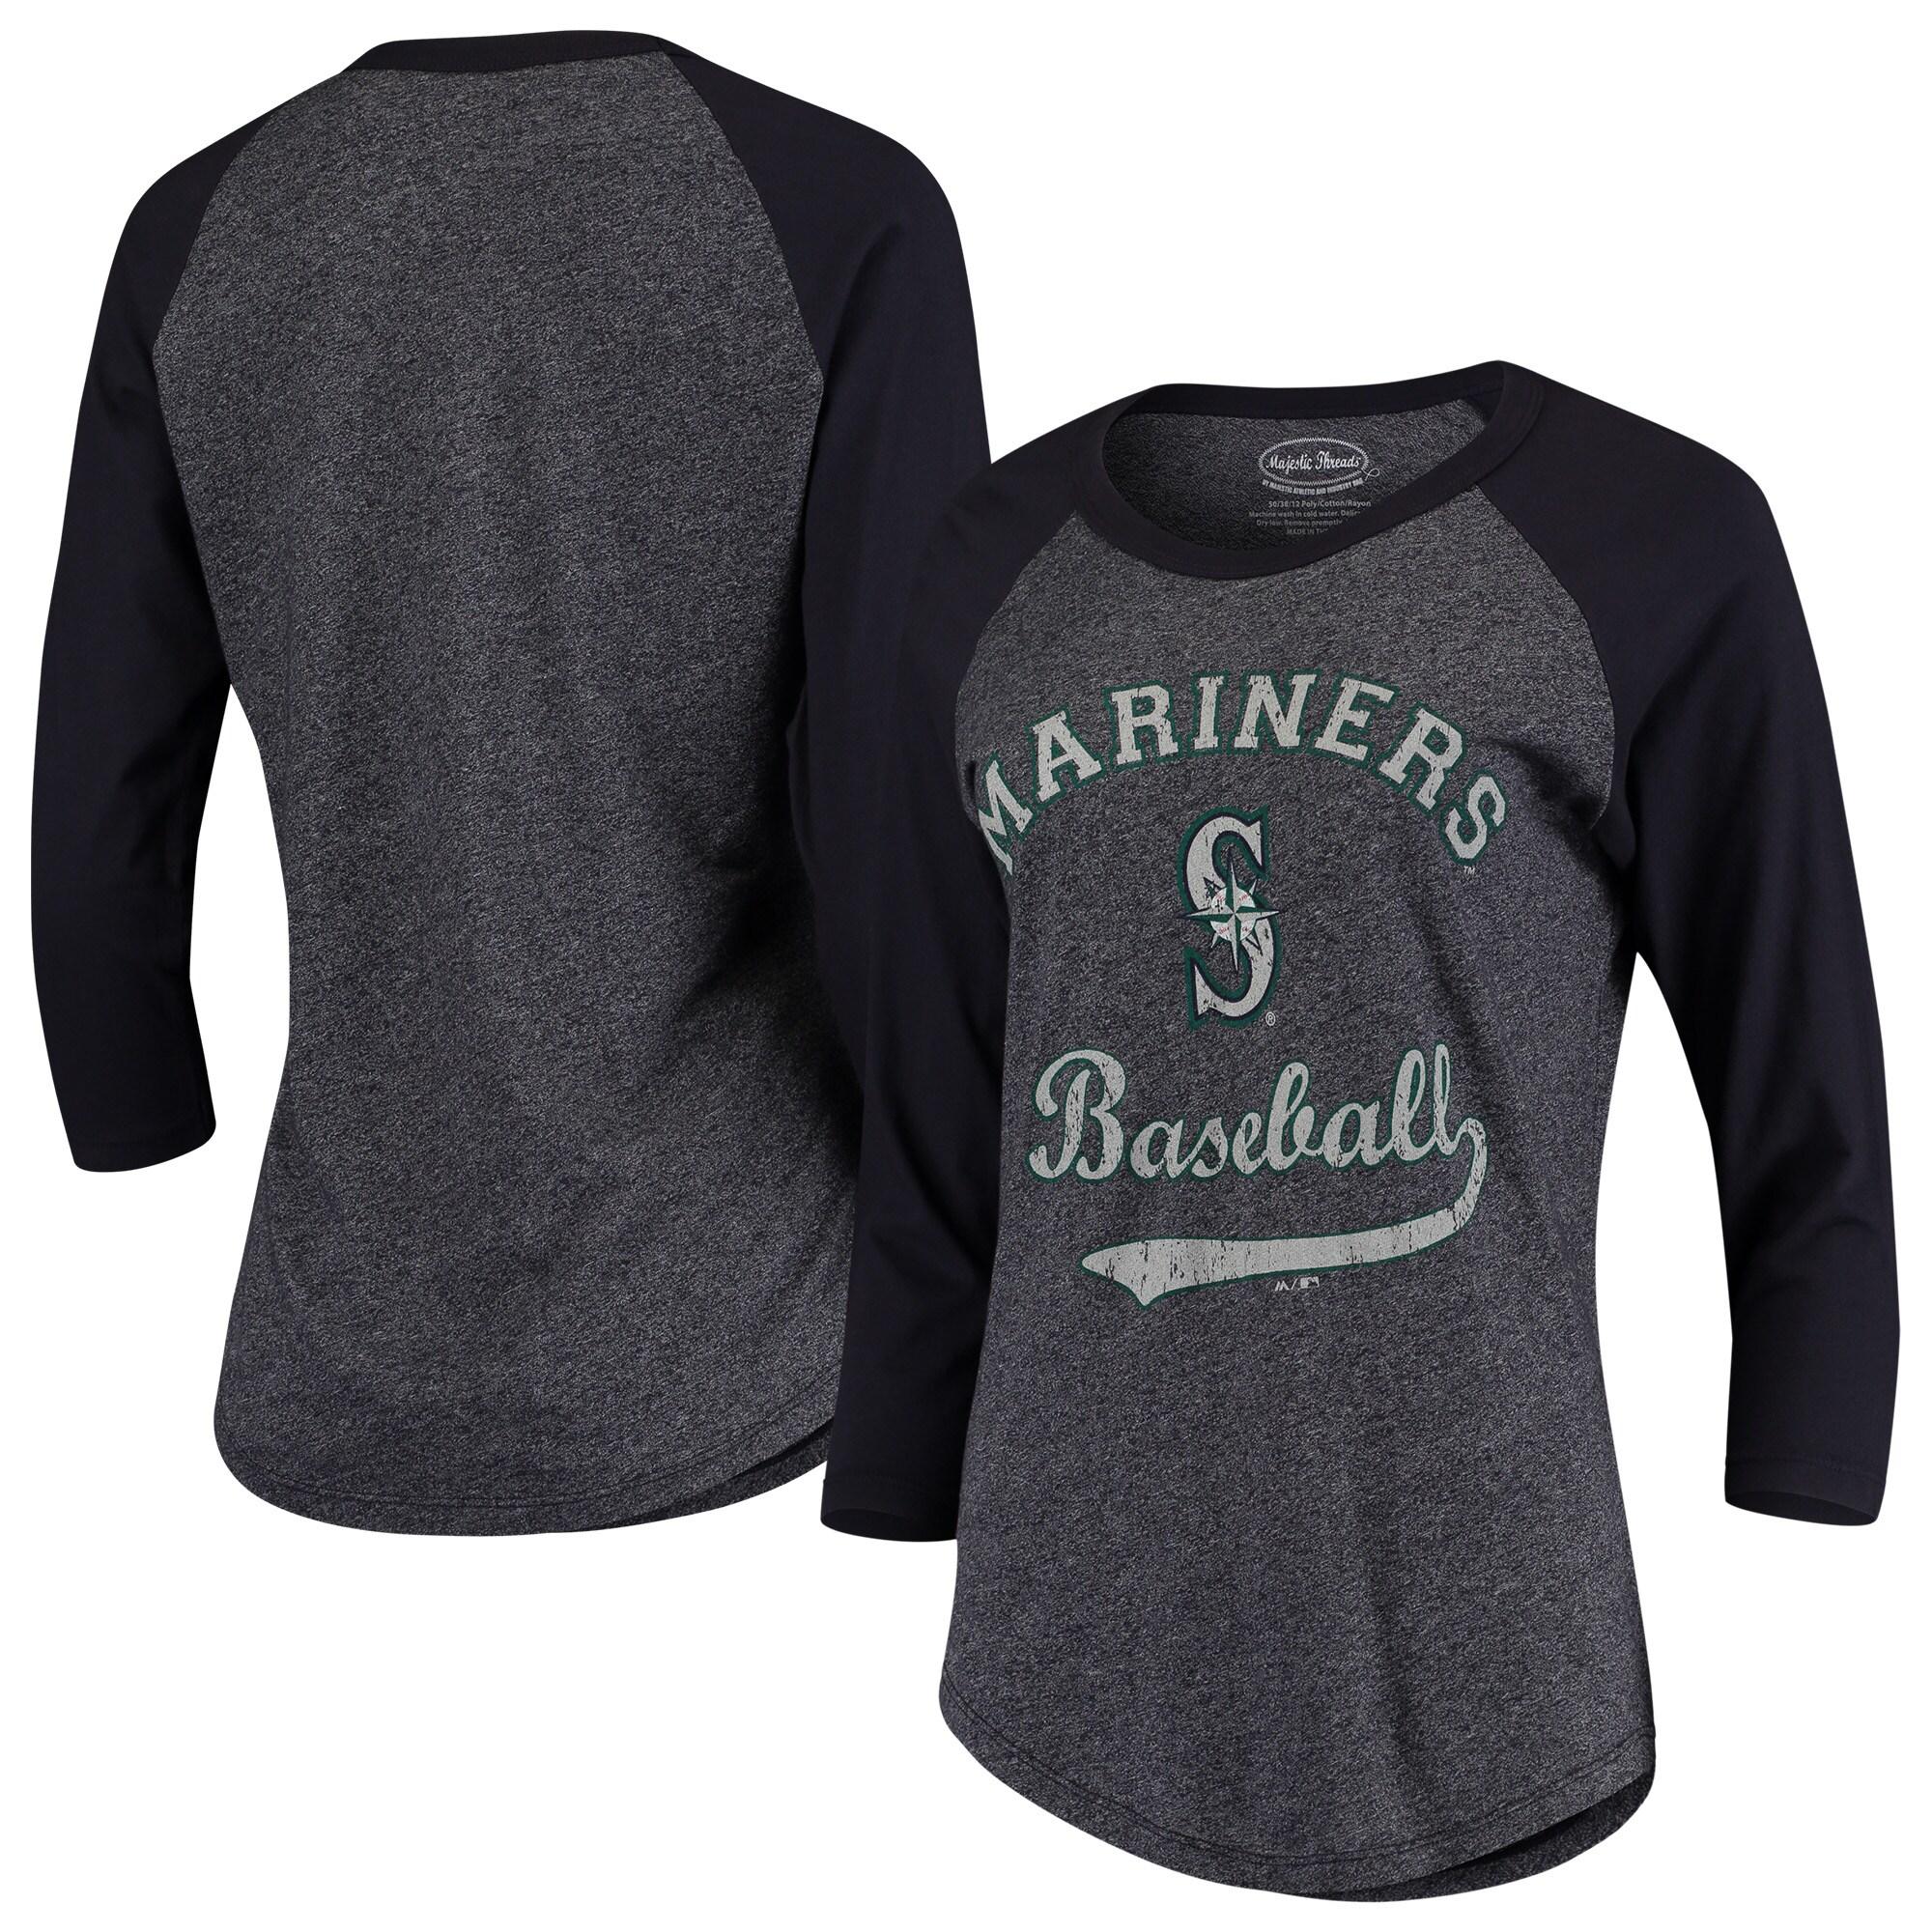 Seattle Mariners Majestic Threads Women's Team Baseball Three-Quarter Raglan Sleeve Tri-Blend T-Shirt - Navy